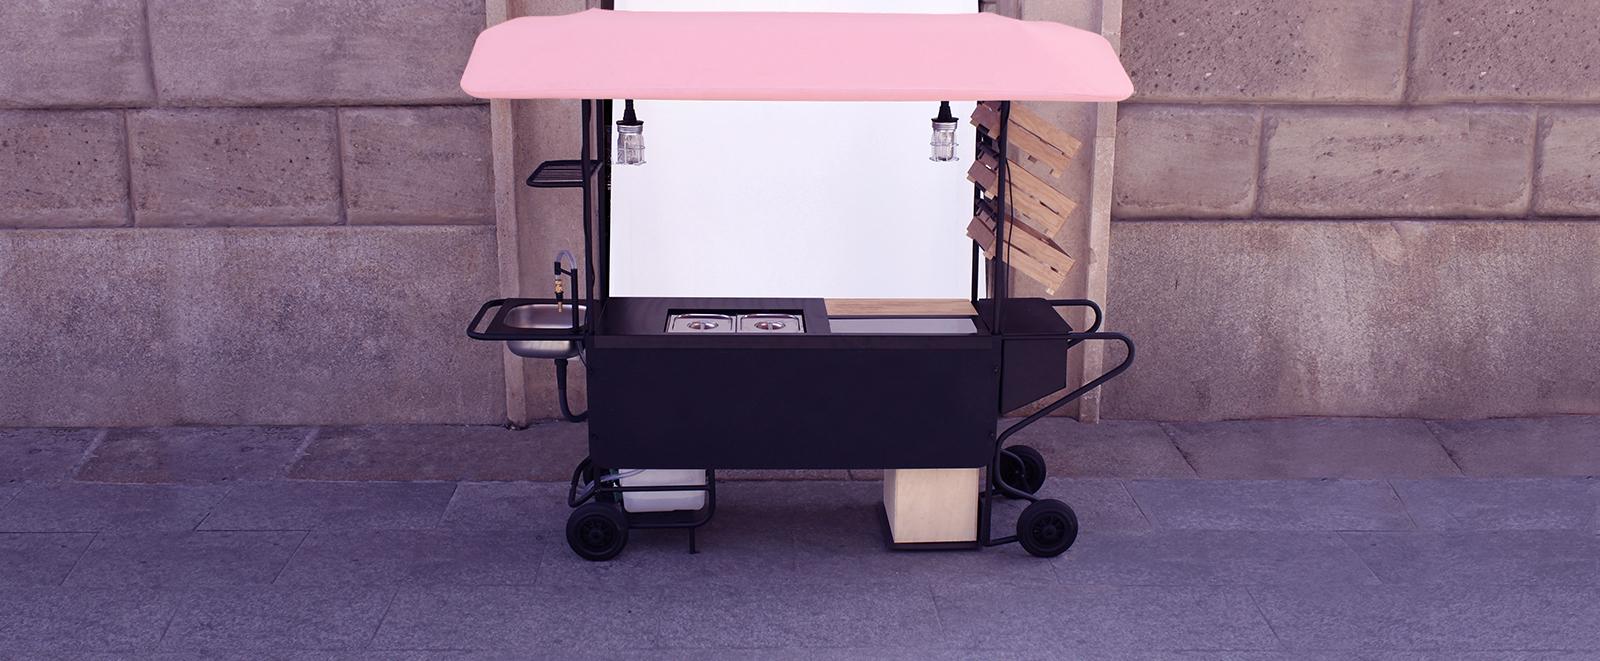 La cuisine mobile